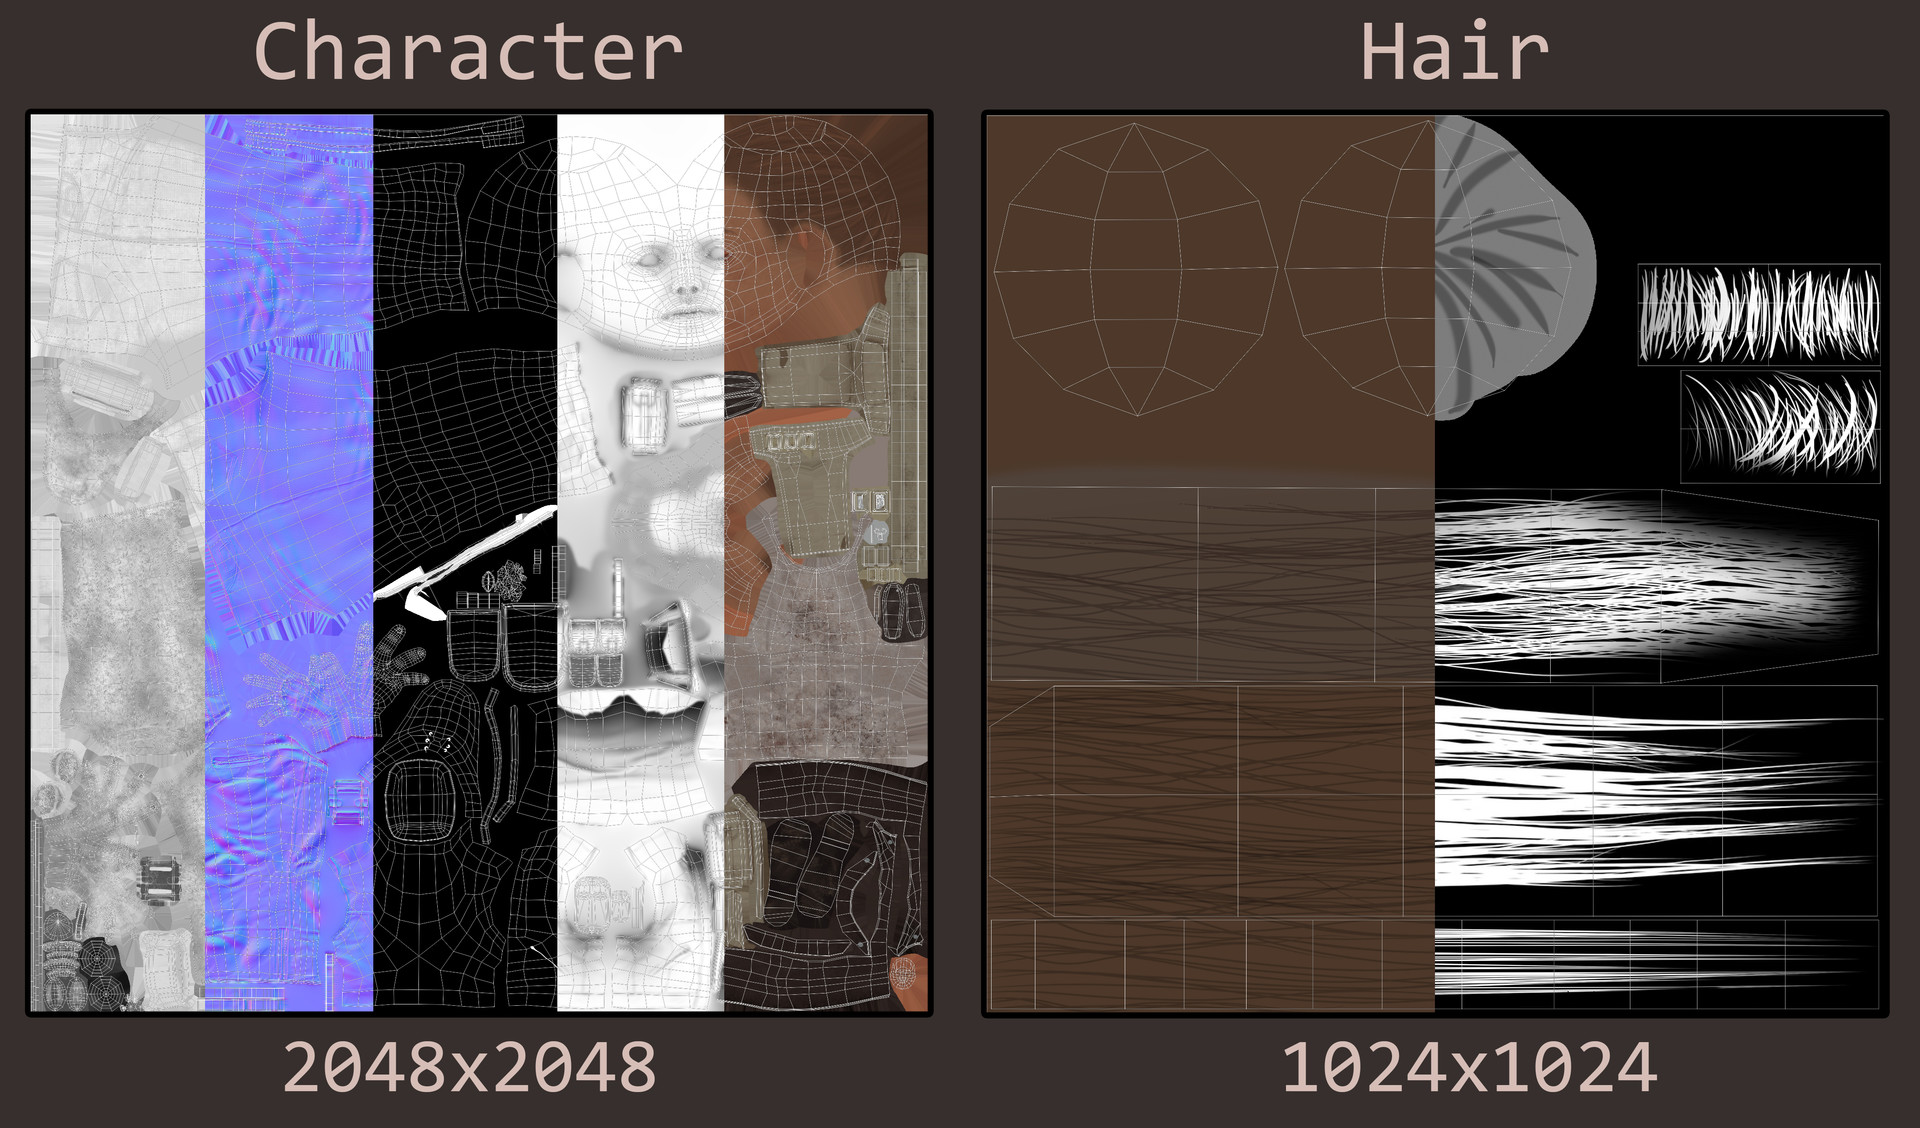 Klara fredriksson texturesheets characterandhair